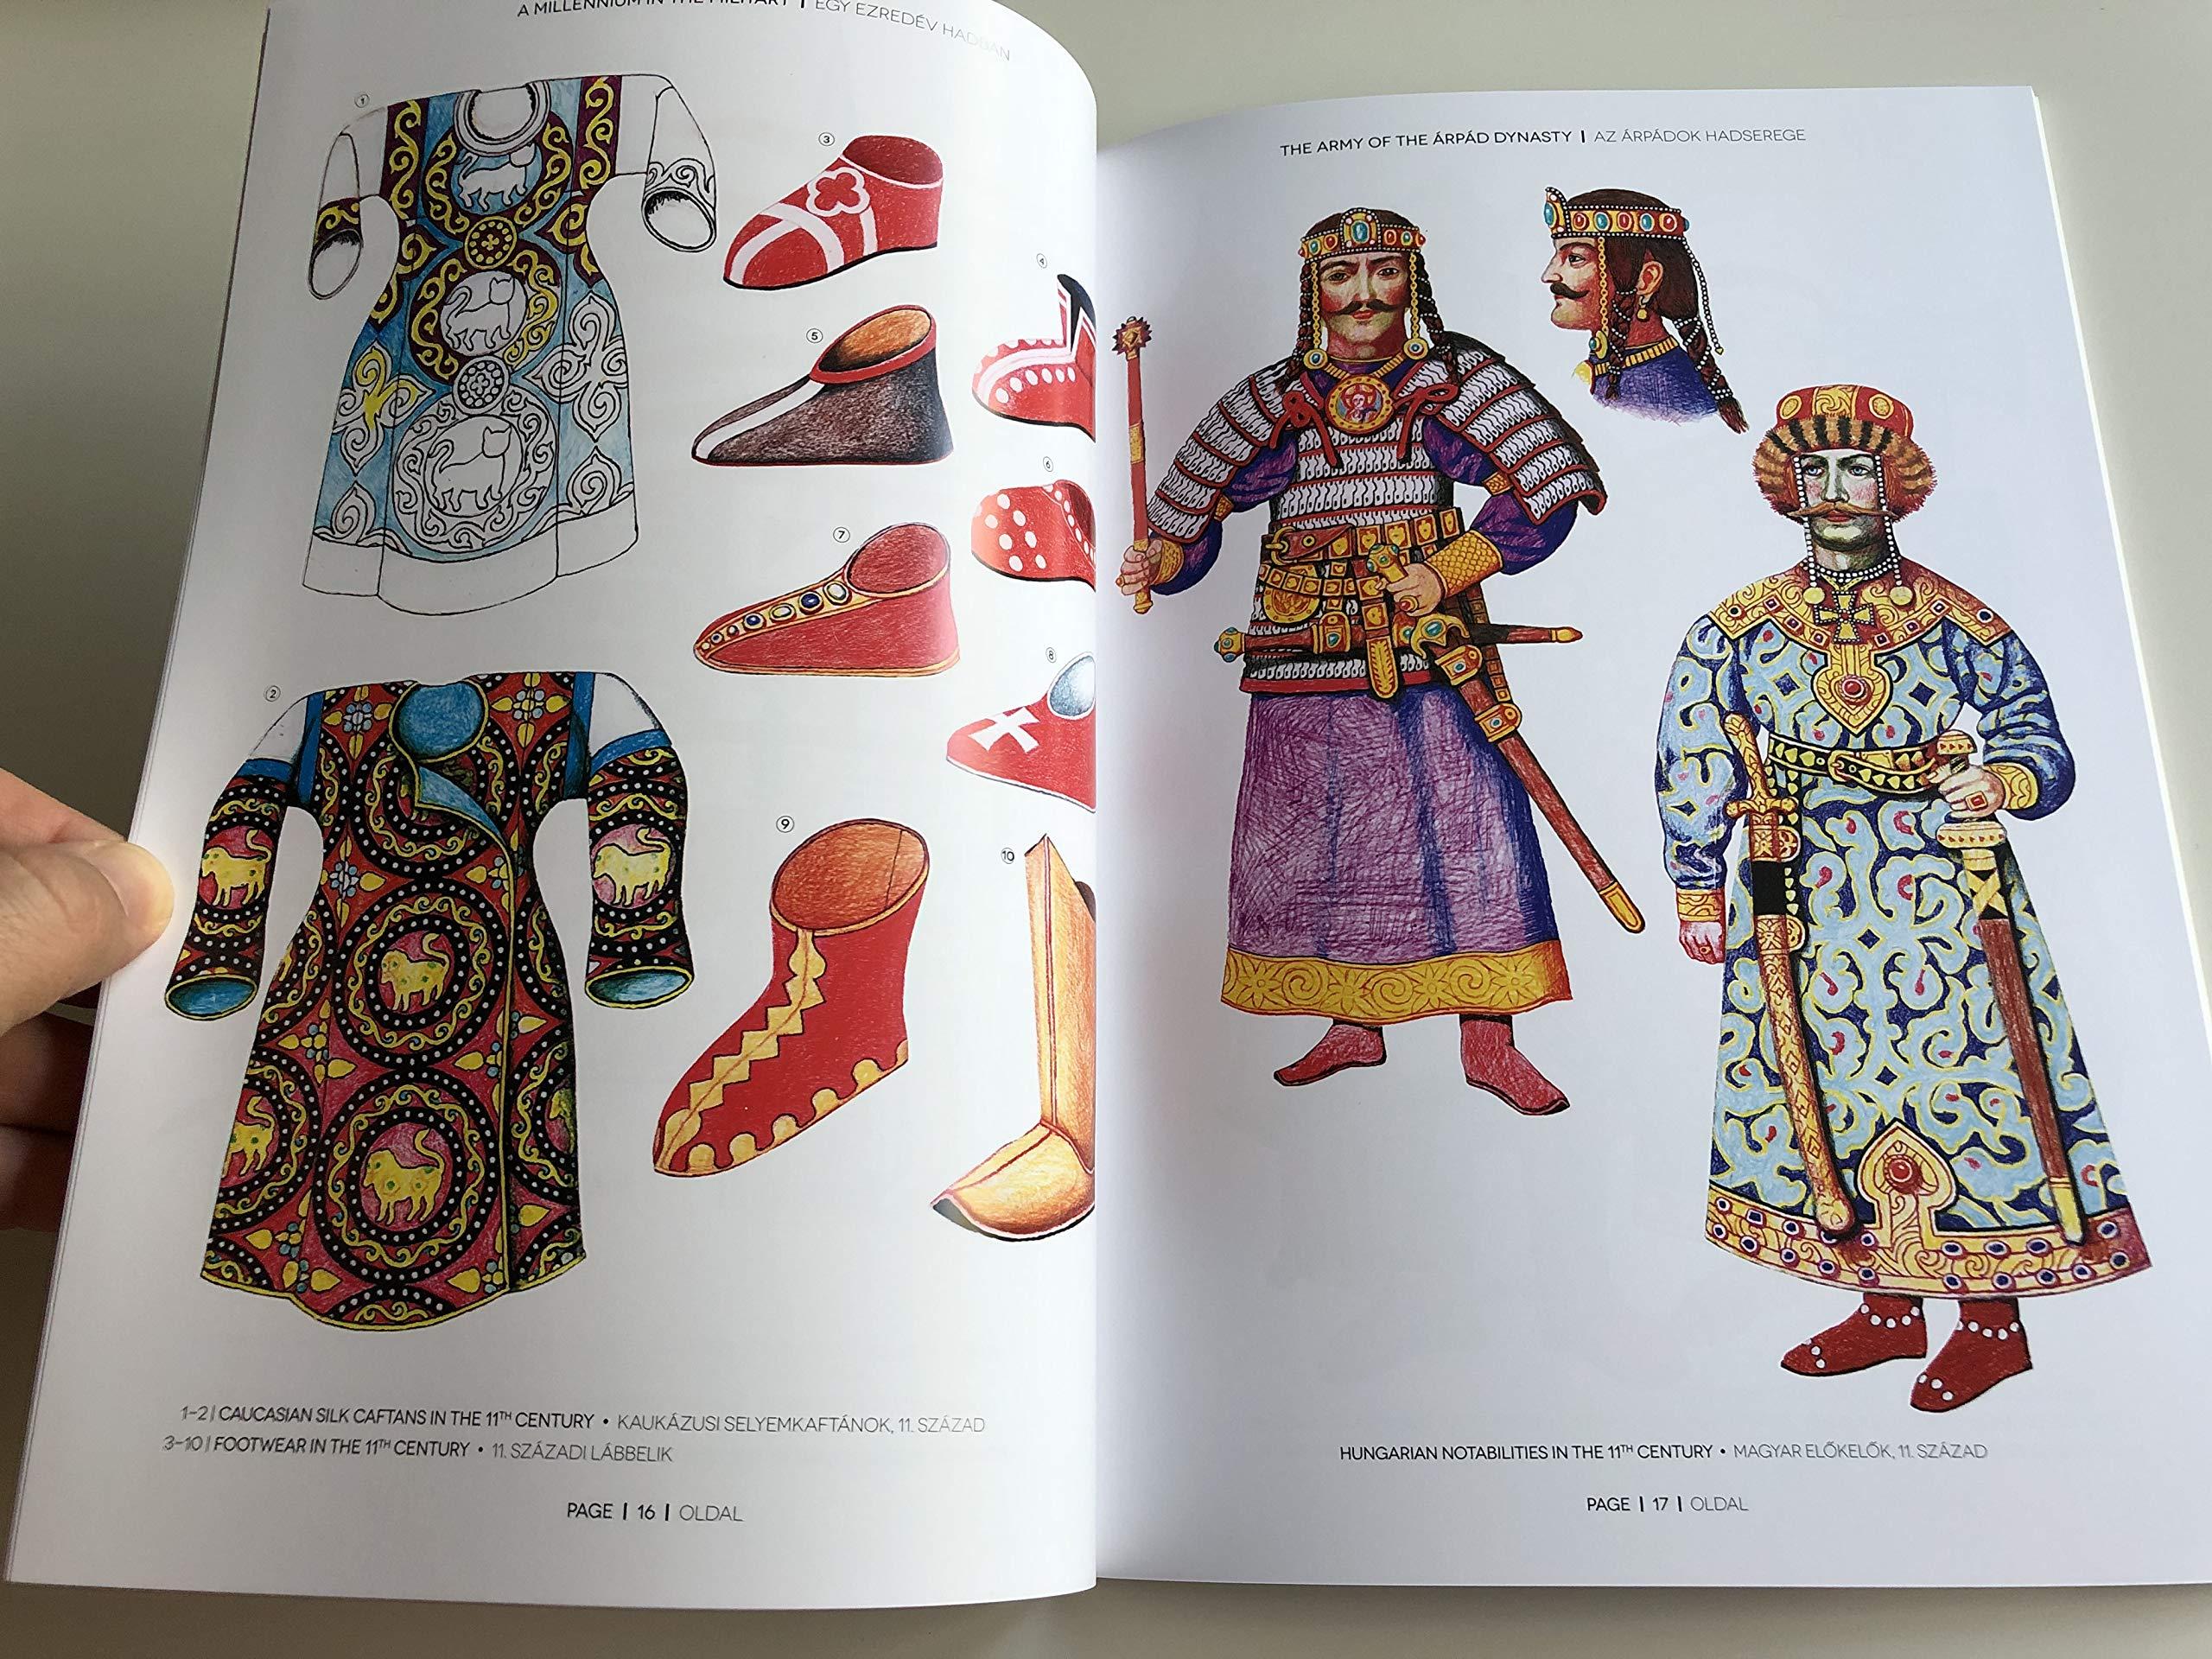 Árpád dynasty